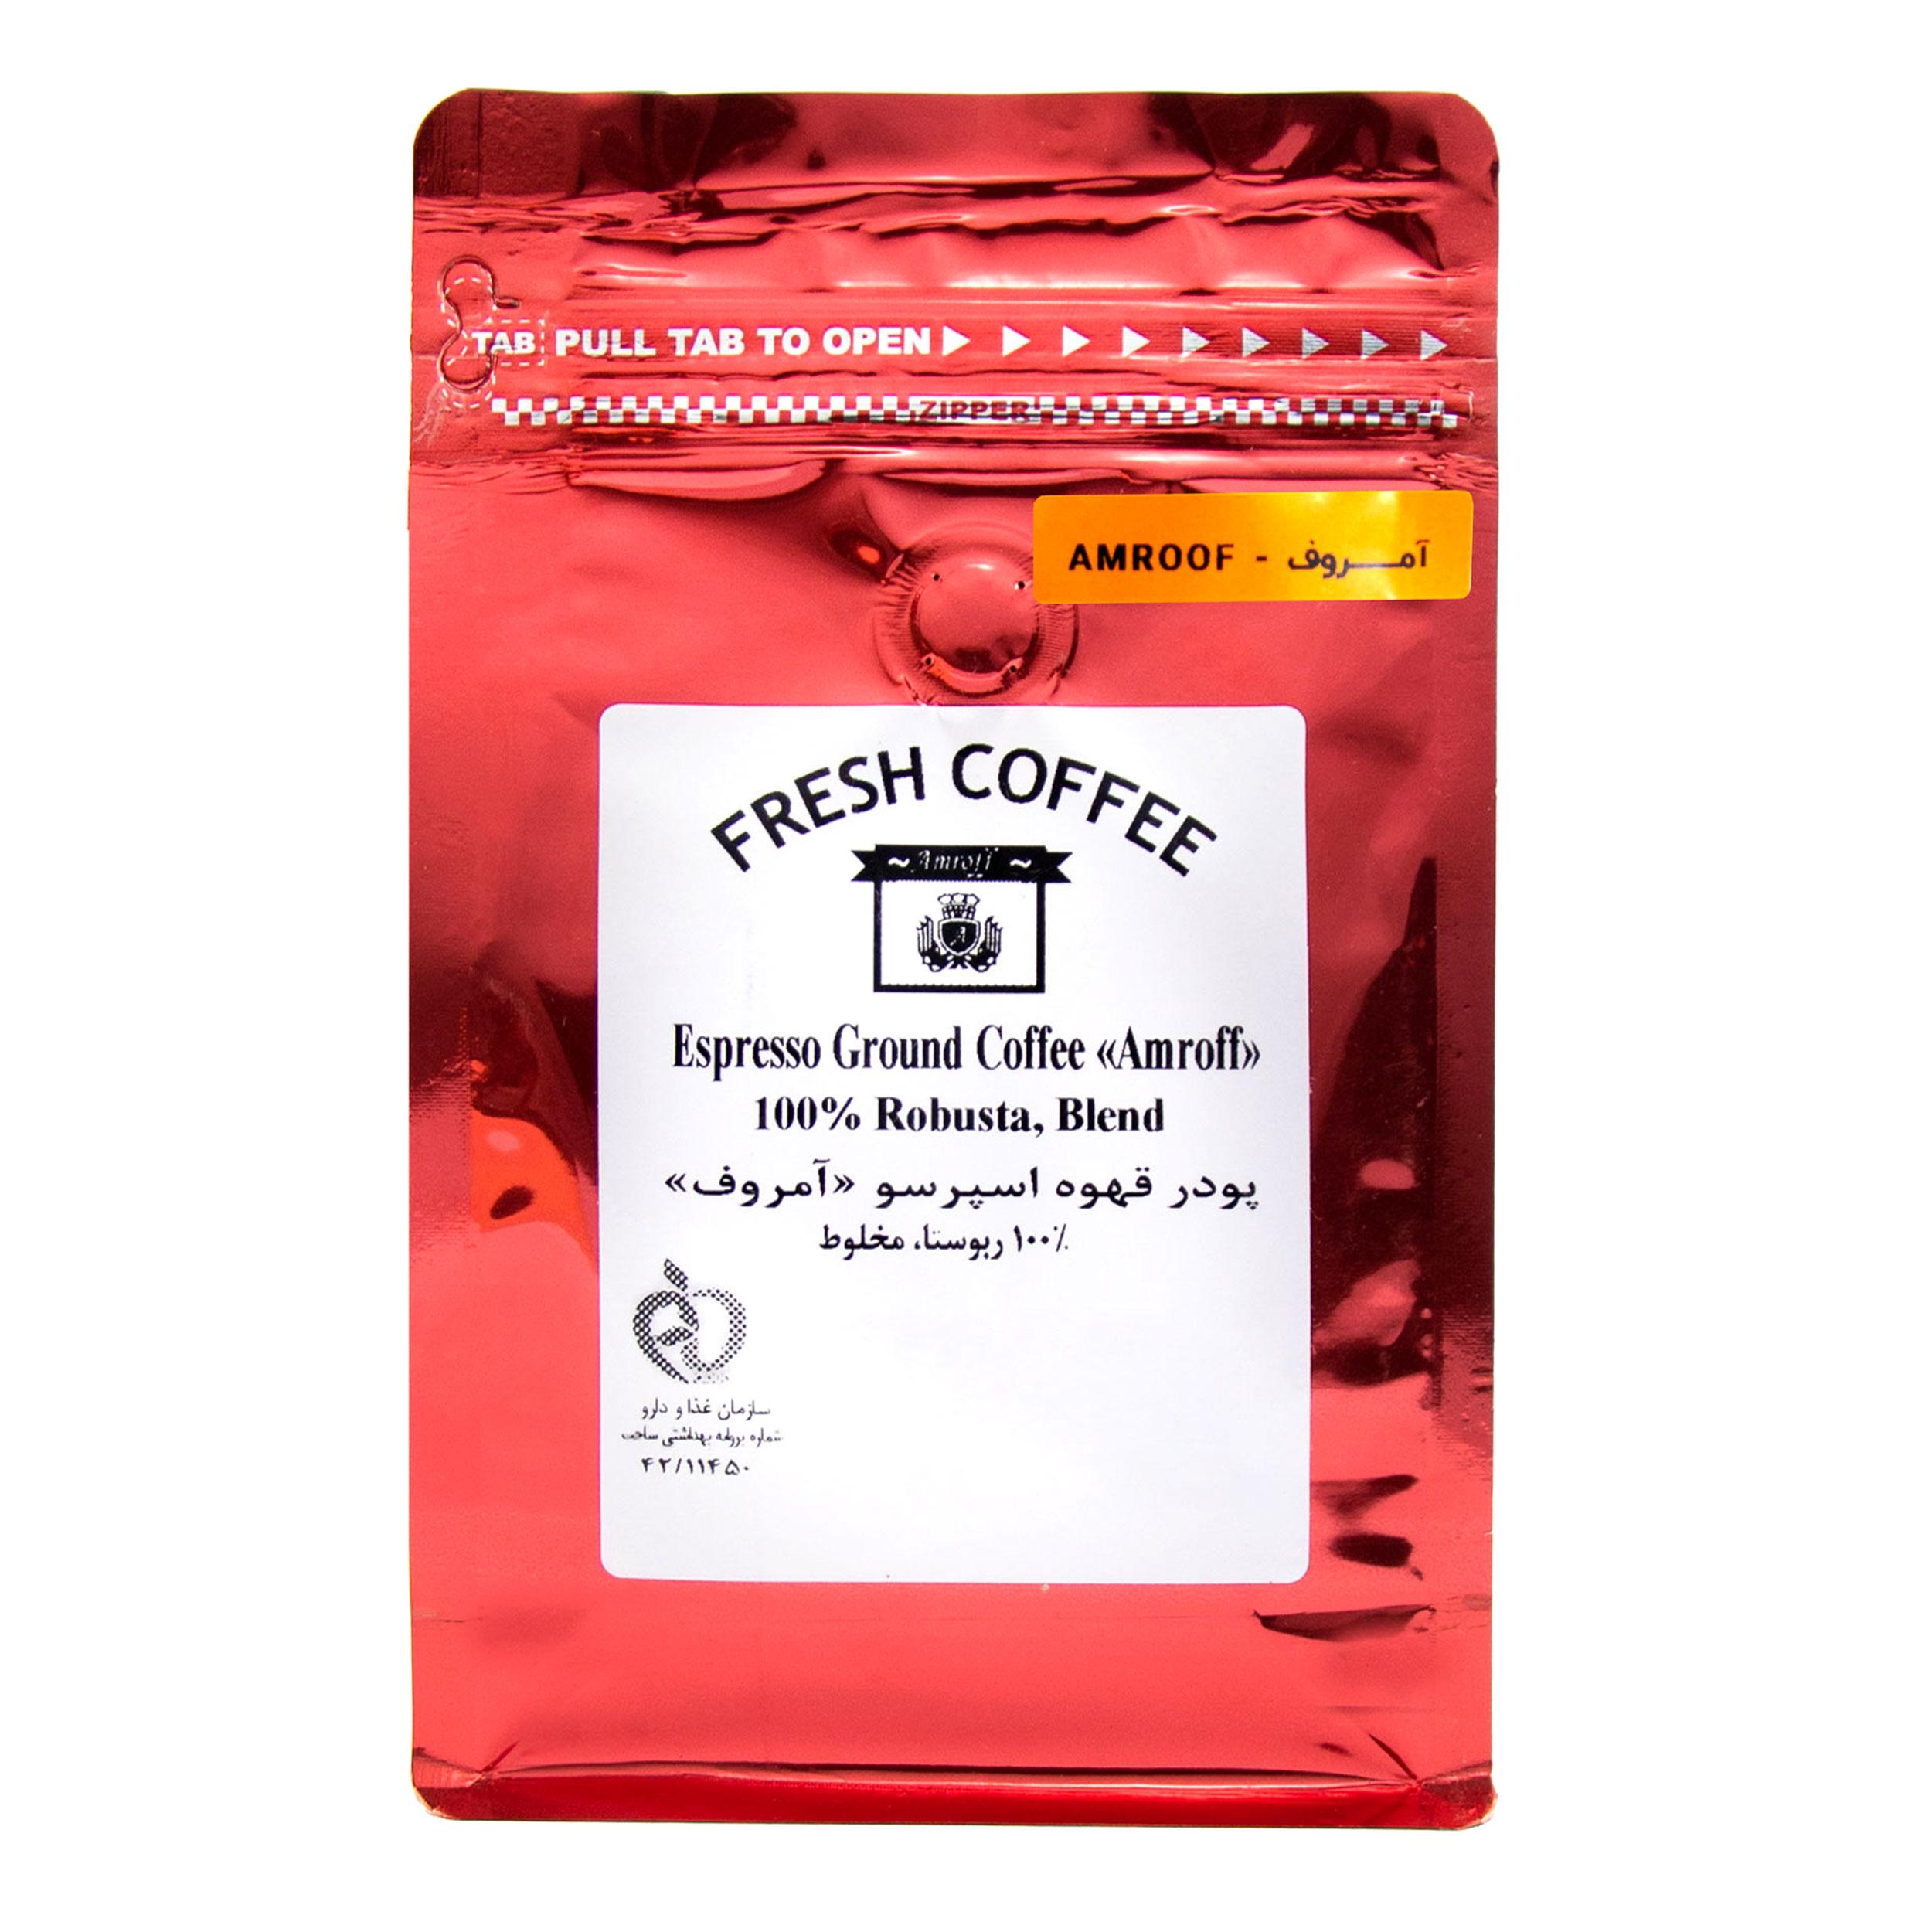 قهوه اسپرسو 100 ربوستا آمروف - 200 گرم